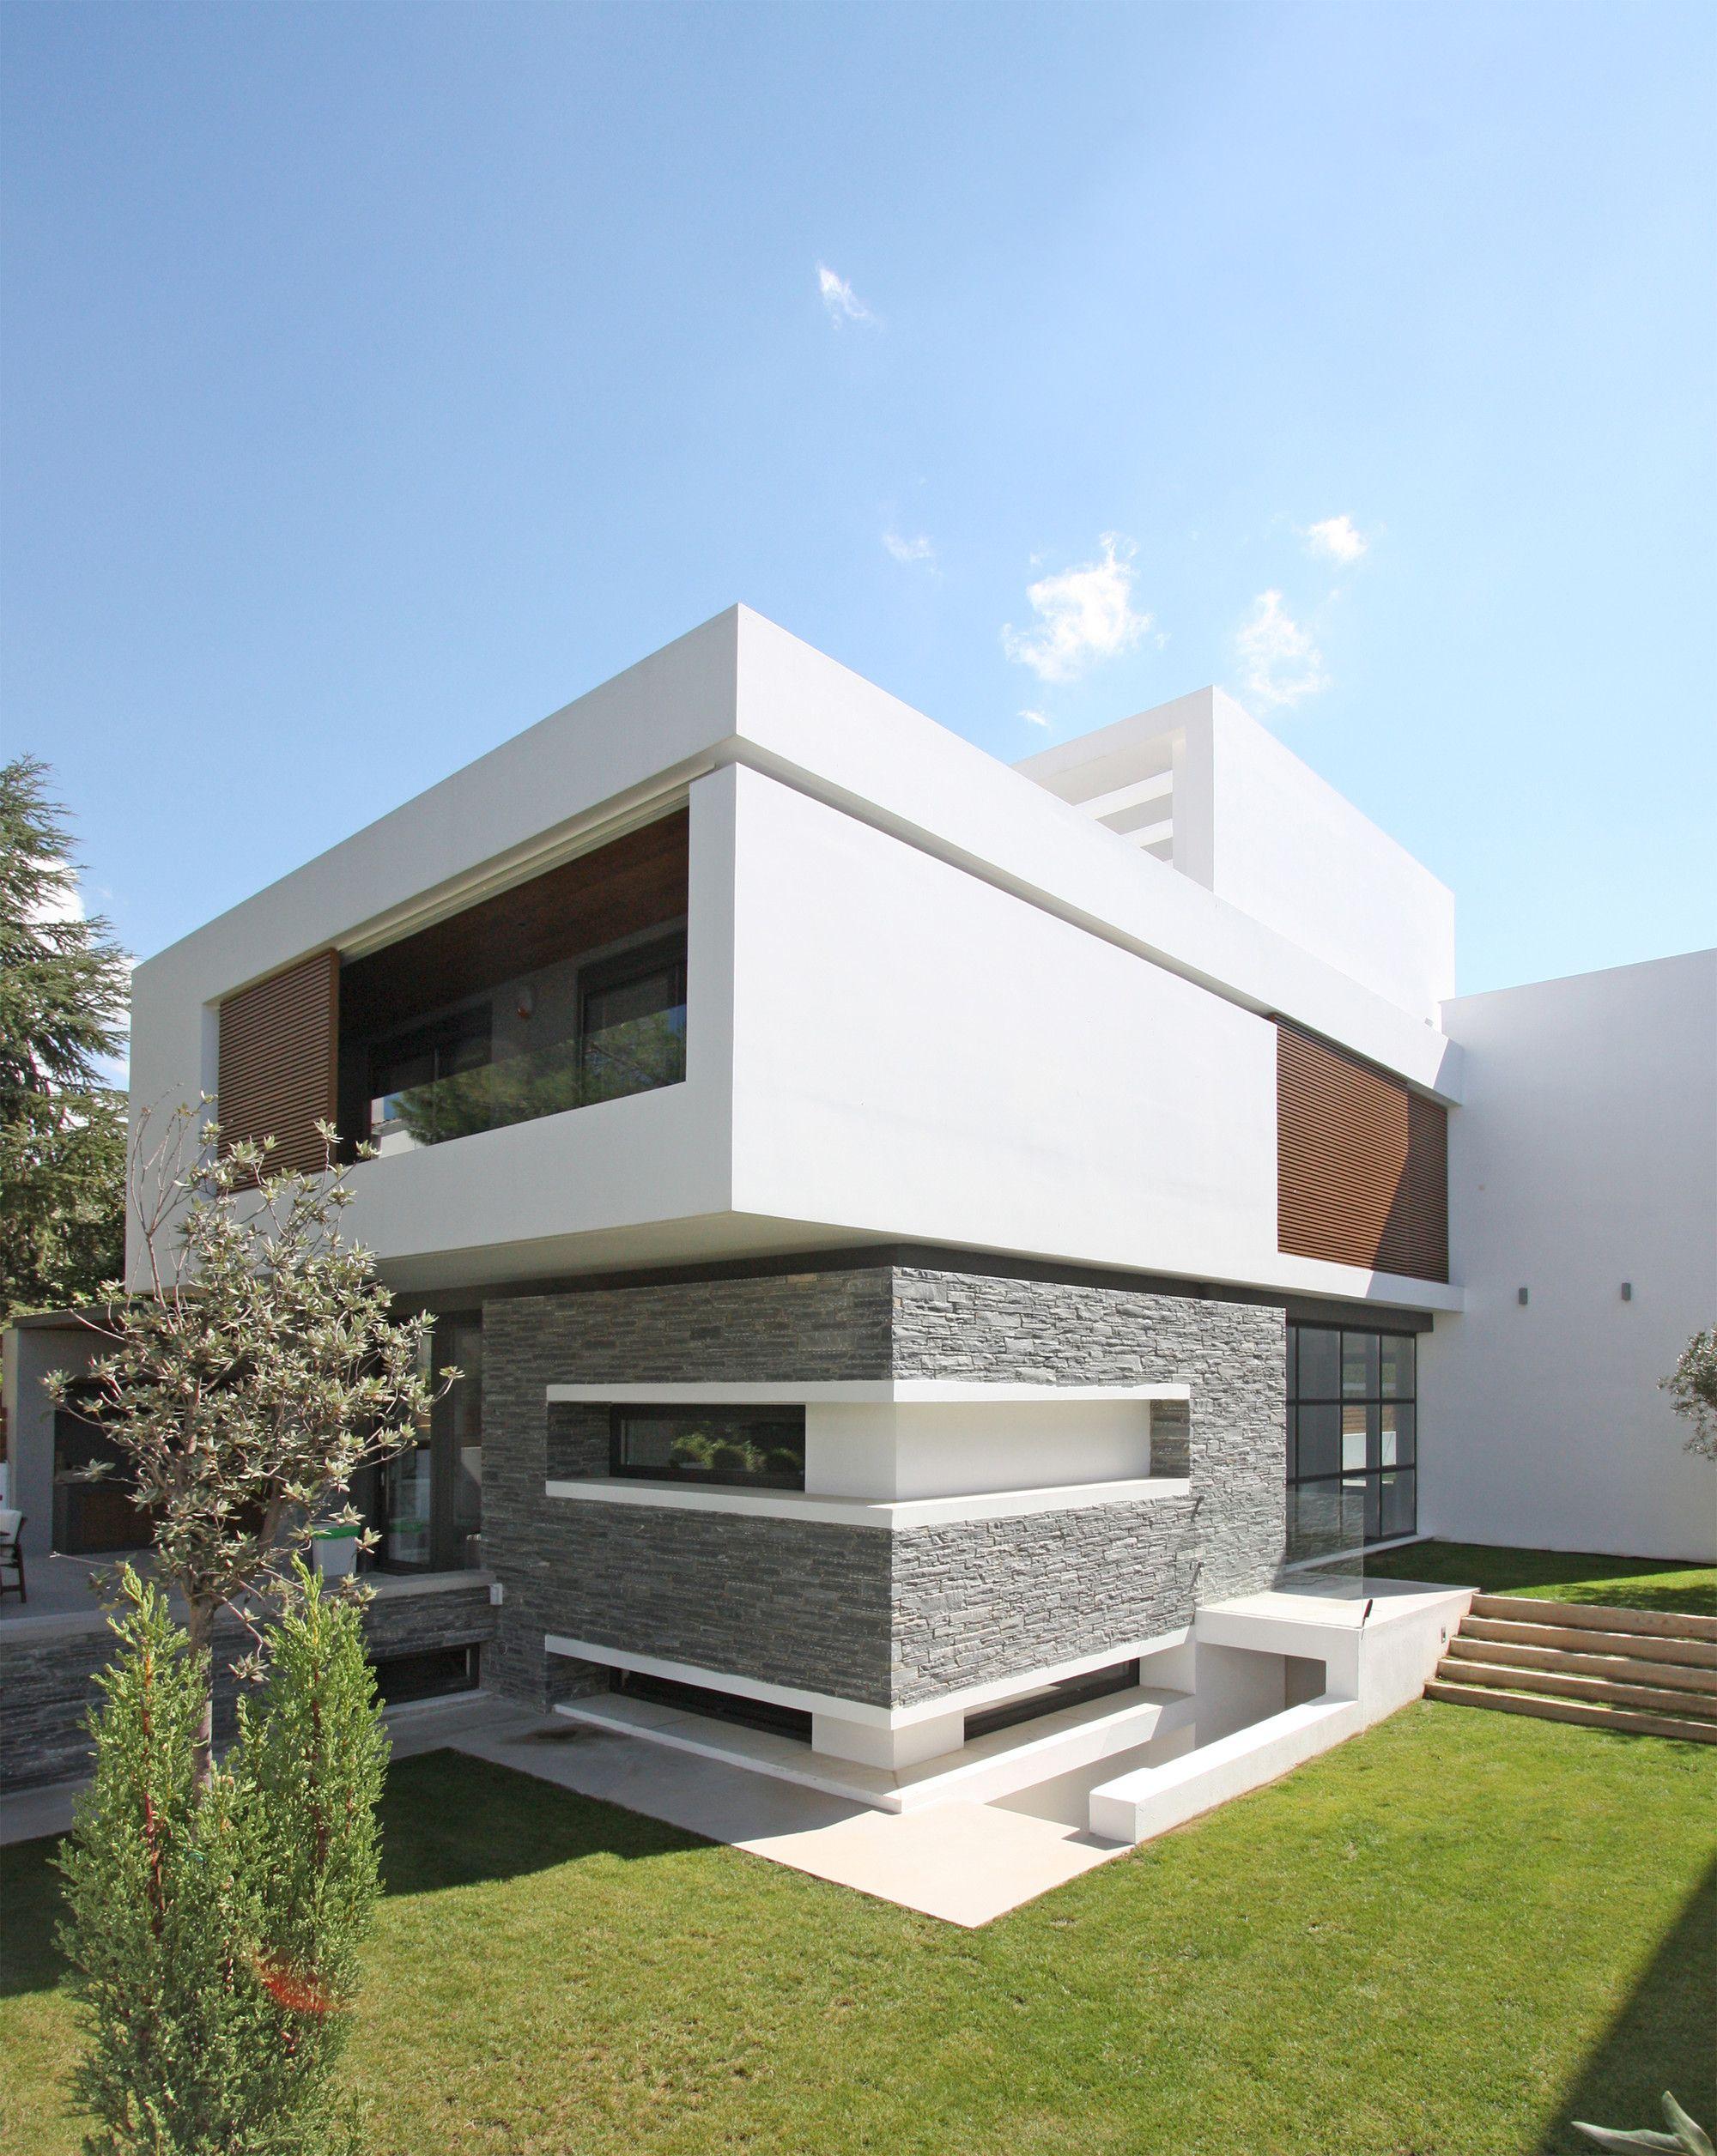 Gallery of 2 houses in panorama office twentyfive architects 5 en 2019 casas casas - Arquitectura casas modernas ...